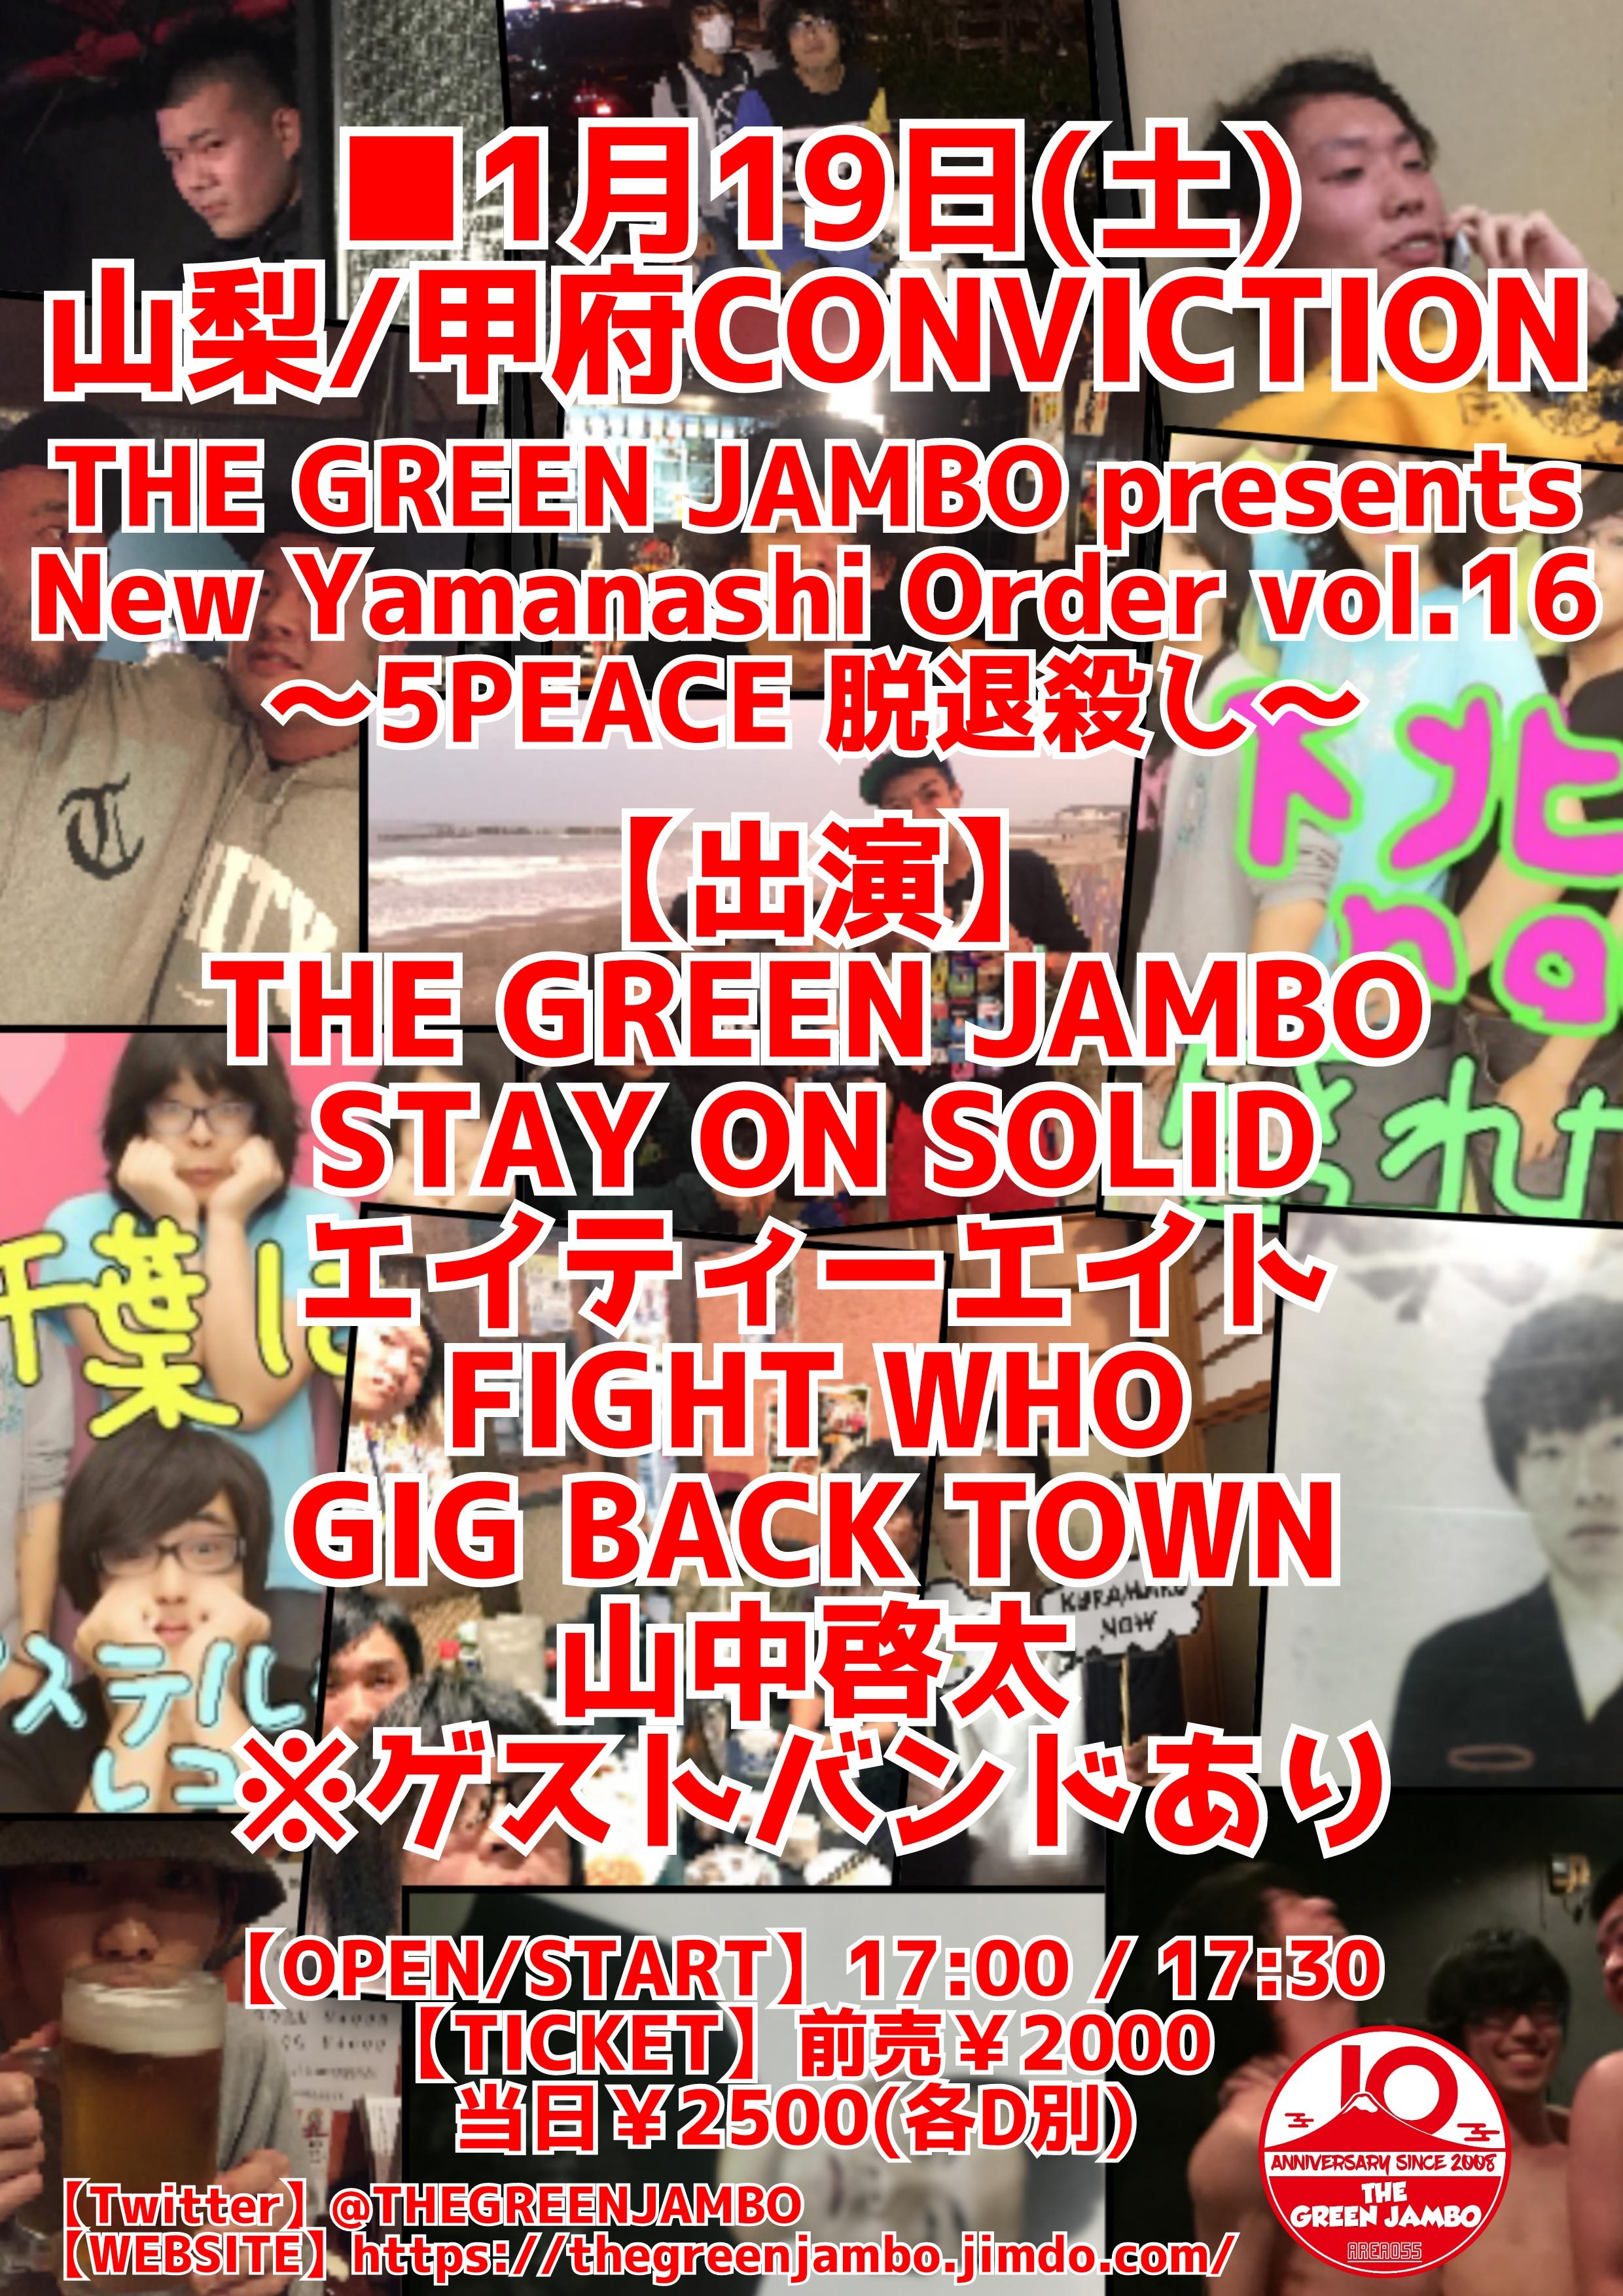 THE GREEN JAMBO pre. 『New Yamanashi Order Vol.16〜脱退殺し〜』